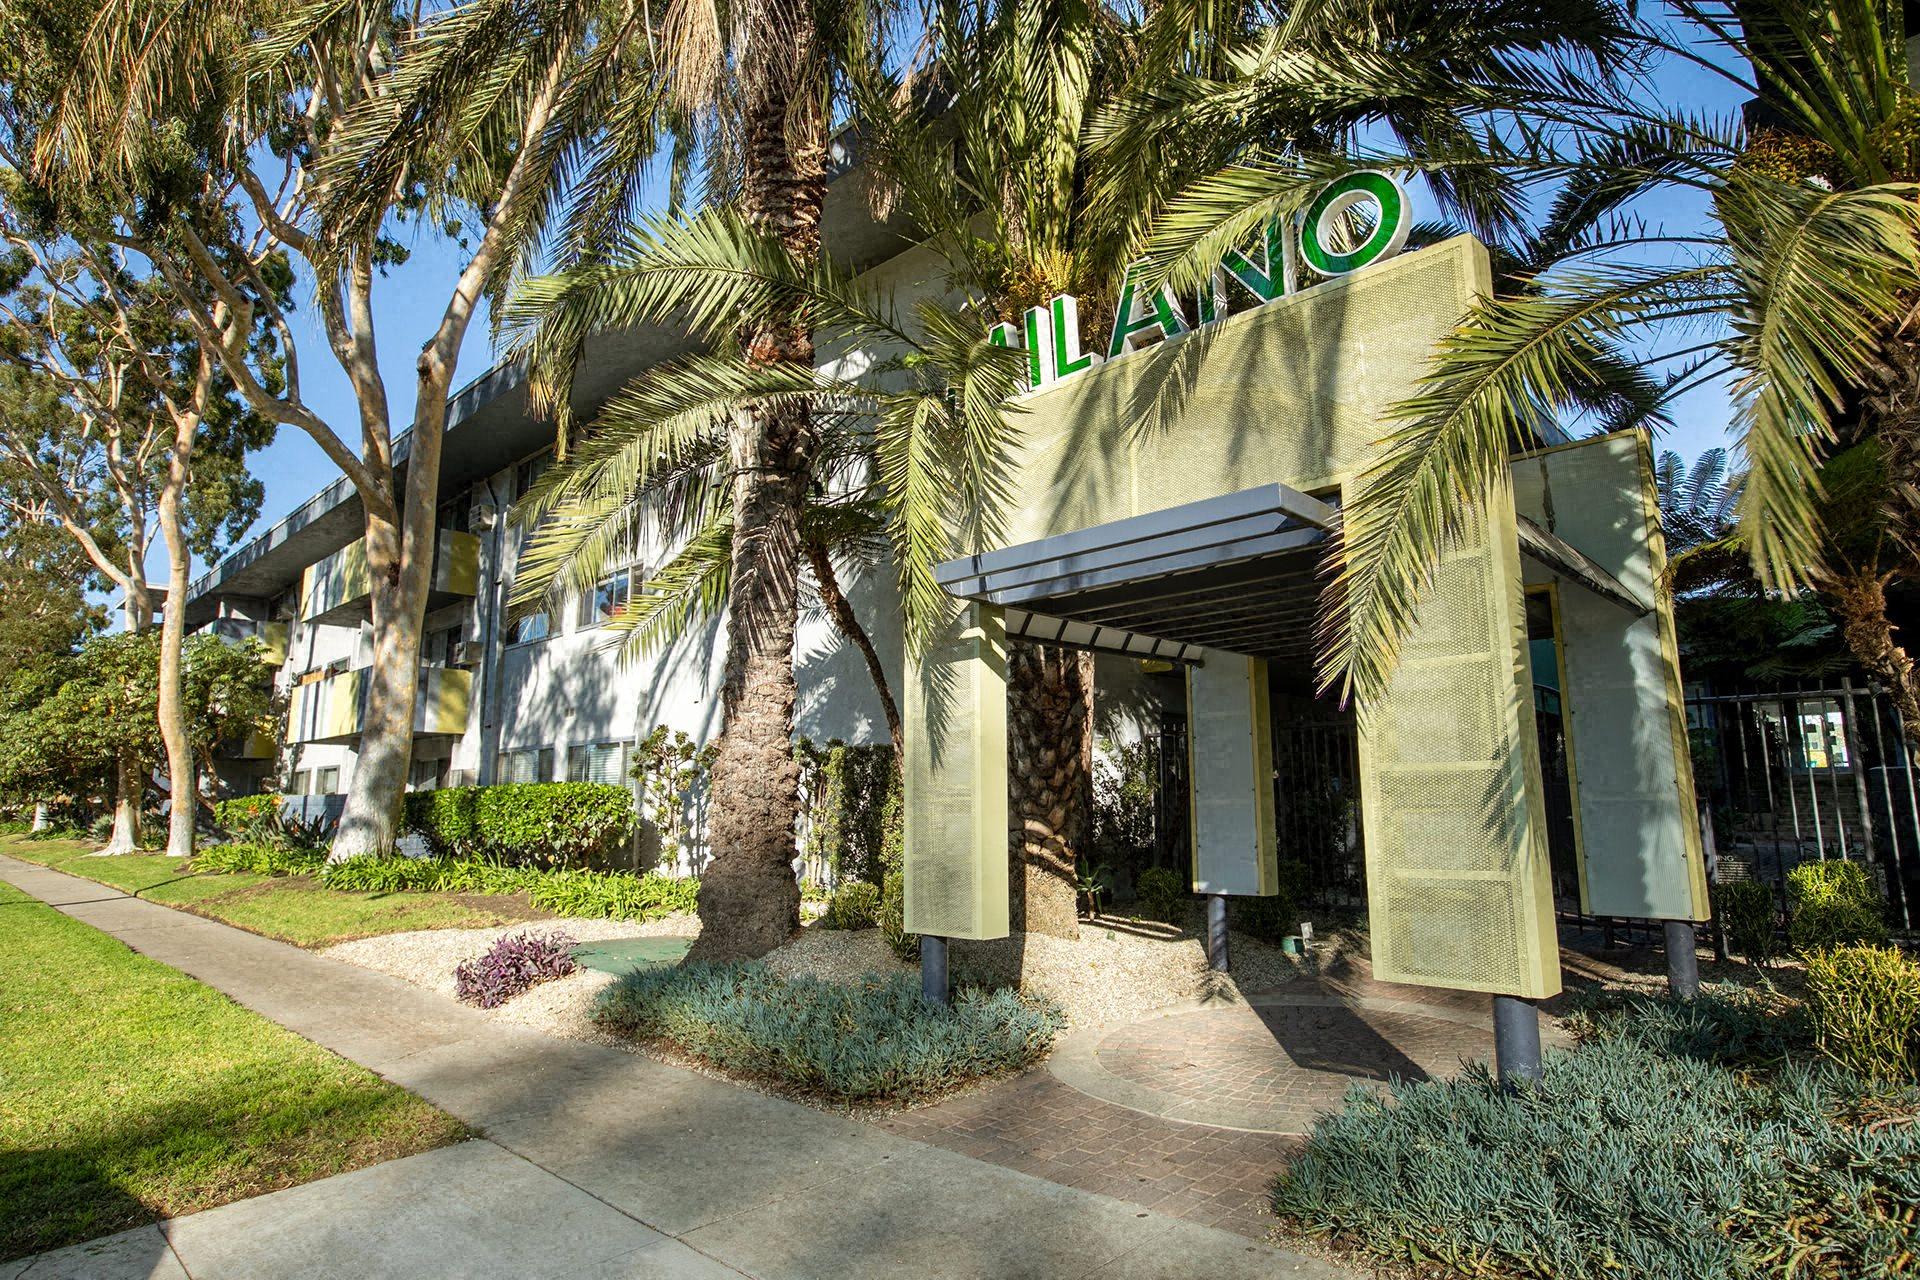 Main Entrance Milano Apartments 20900 Anza Ave Torrance, CA 90503